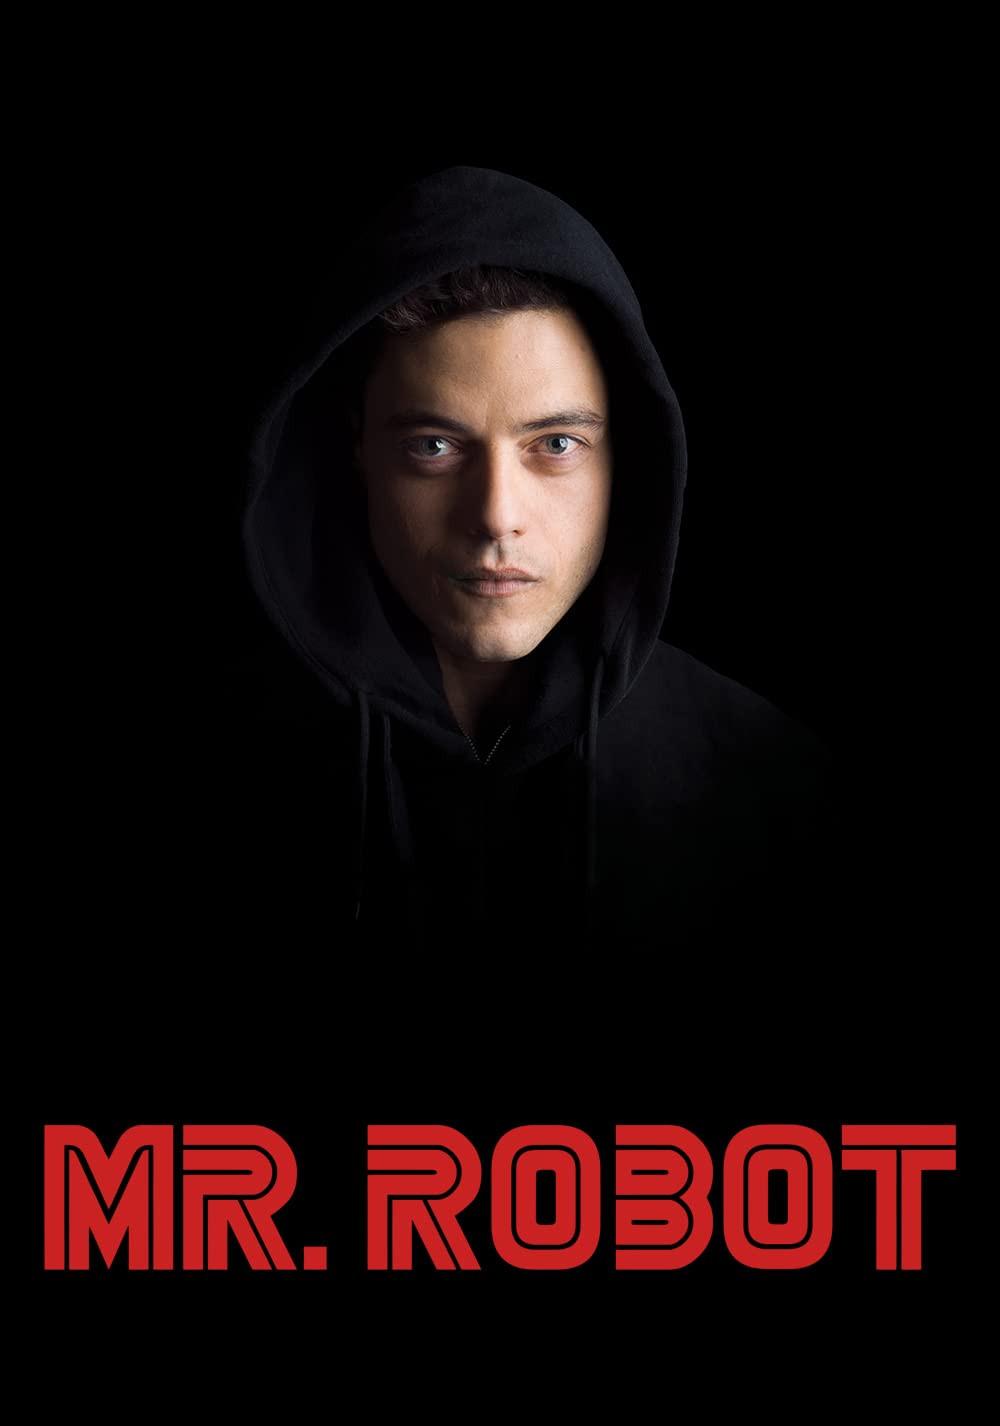 Mr. Robot Series